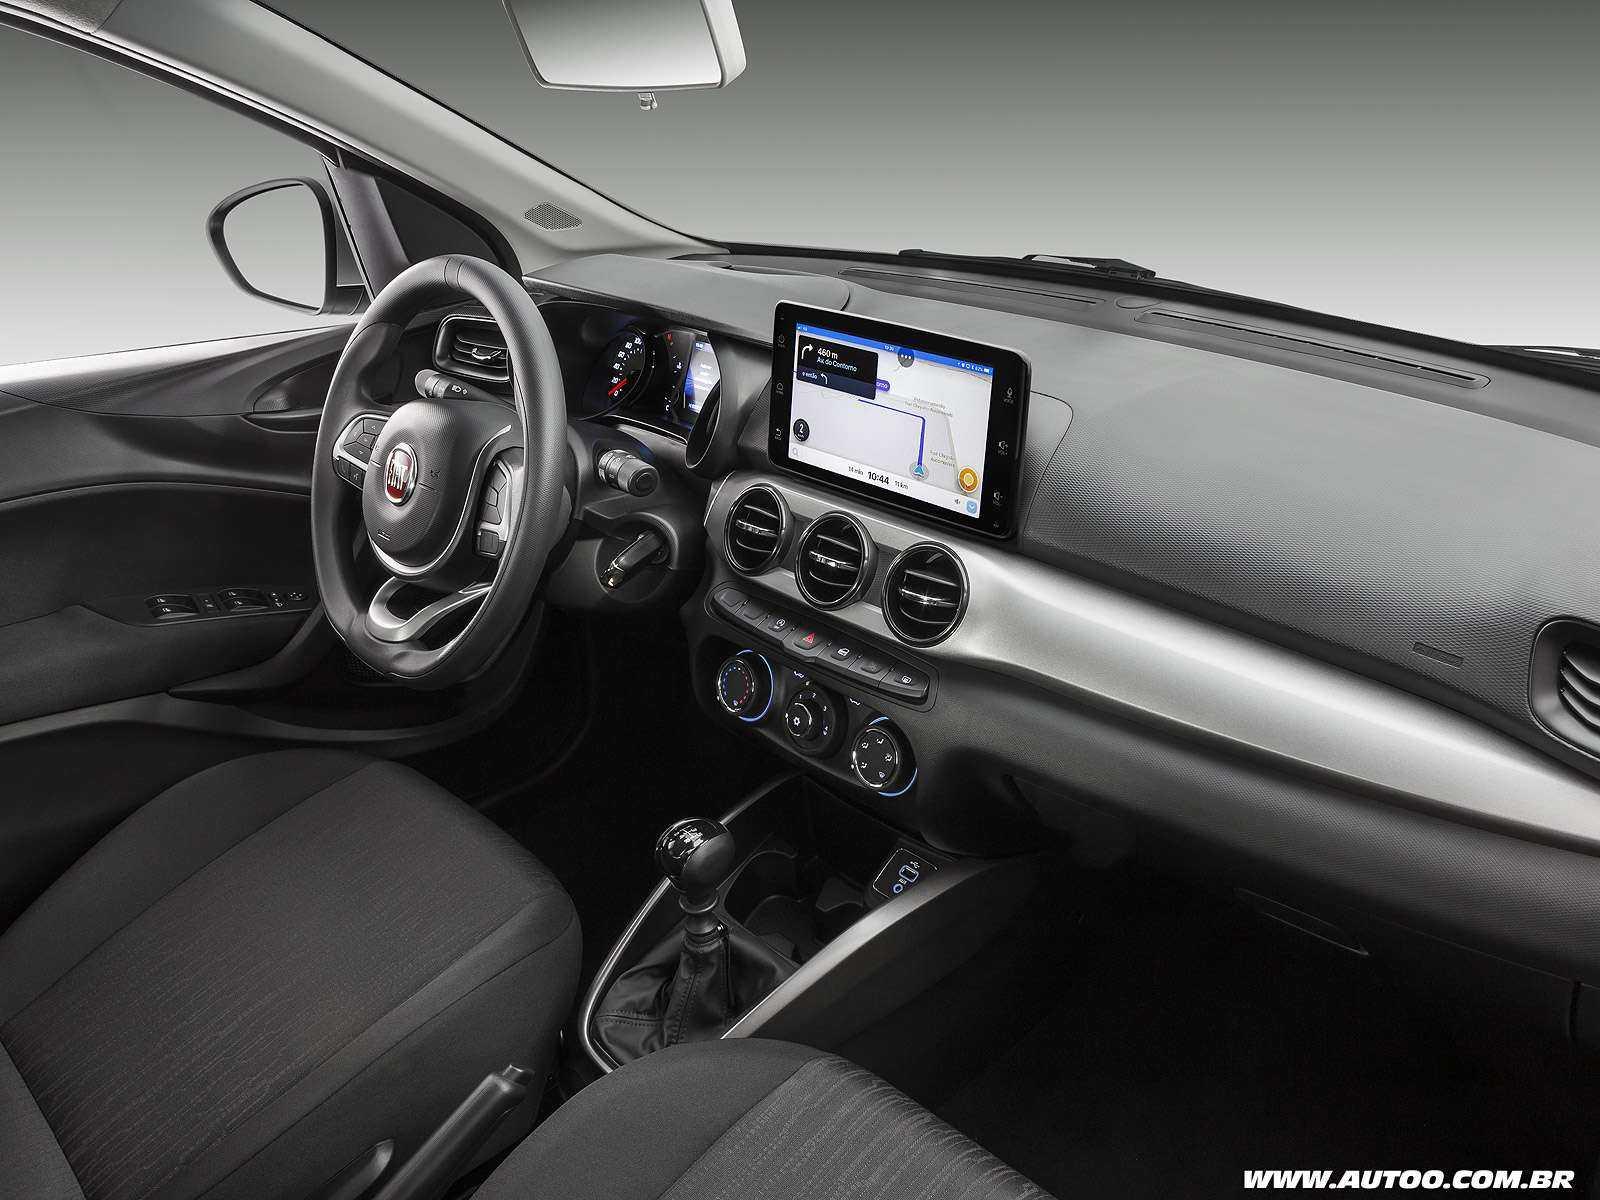 FiatArgo 2019 - painel